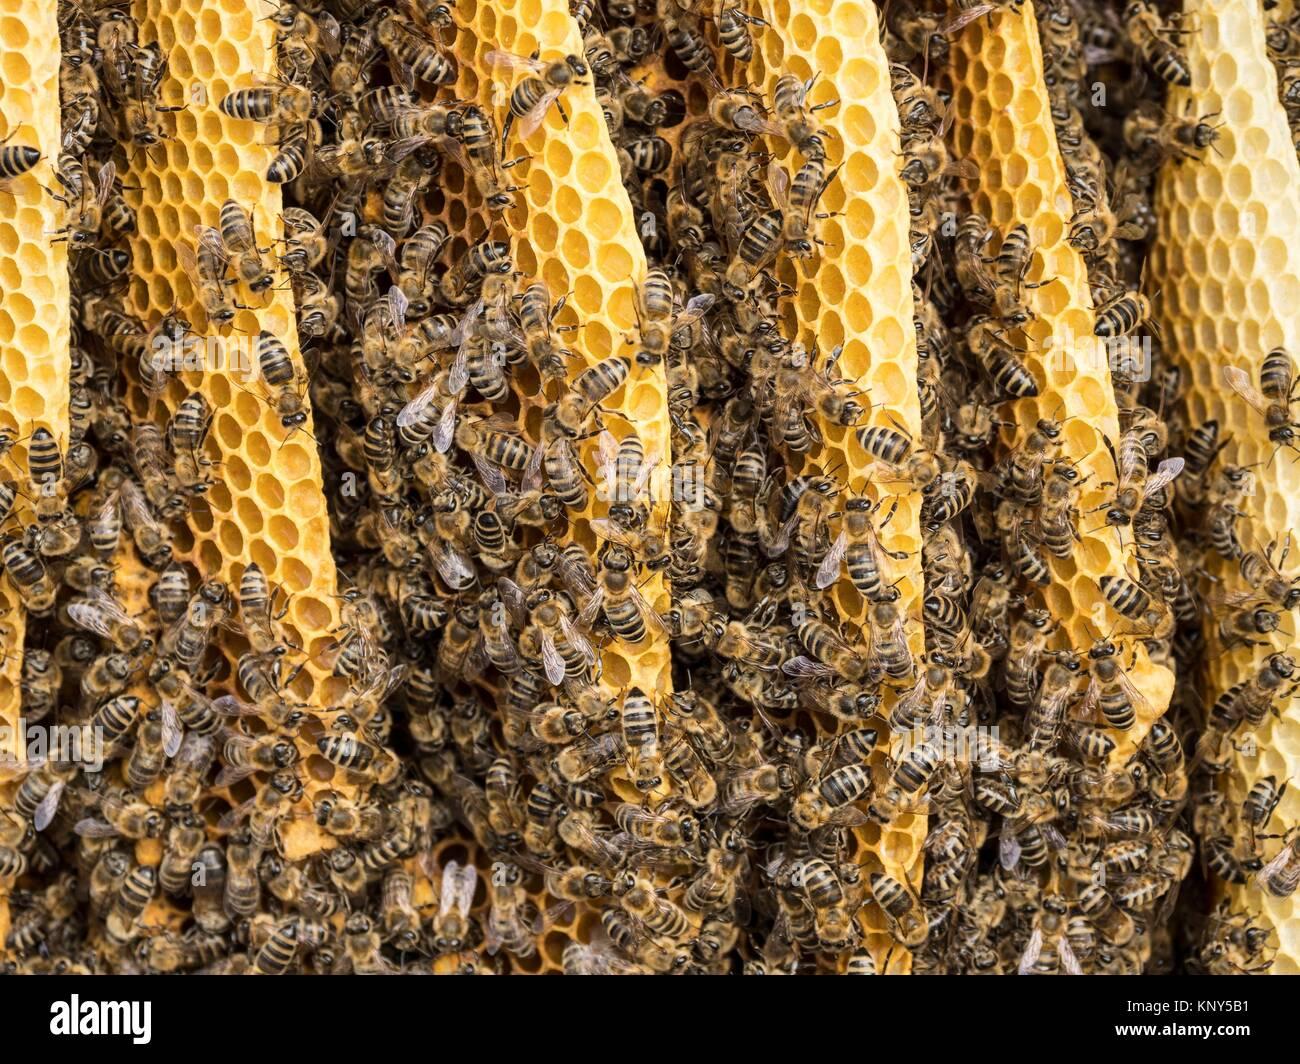 Slovenia Bumble Bees. - Stock Image